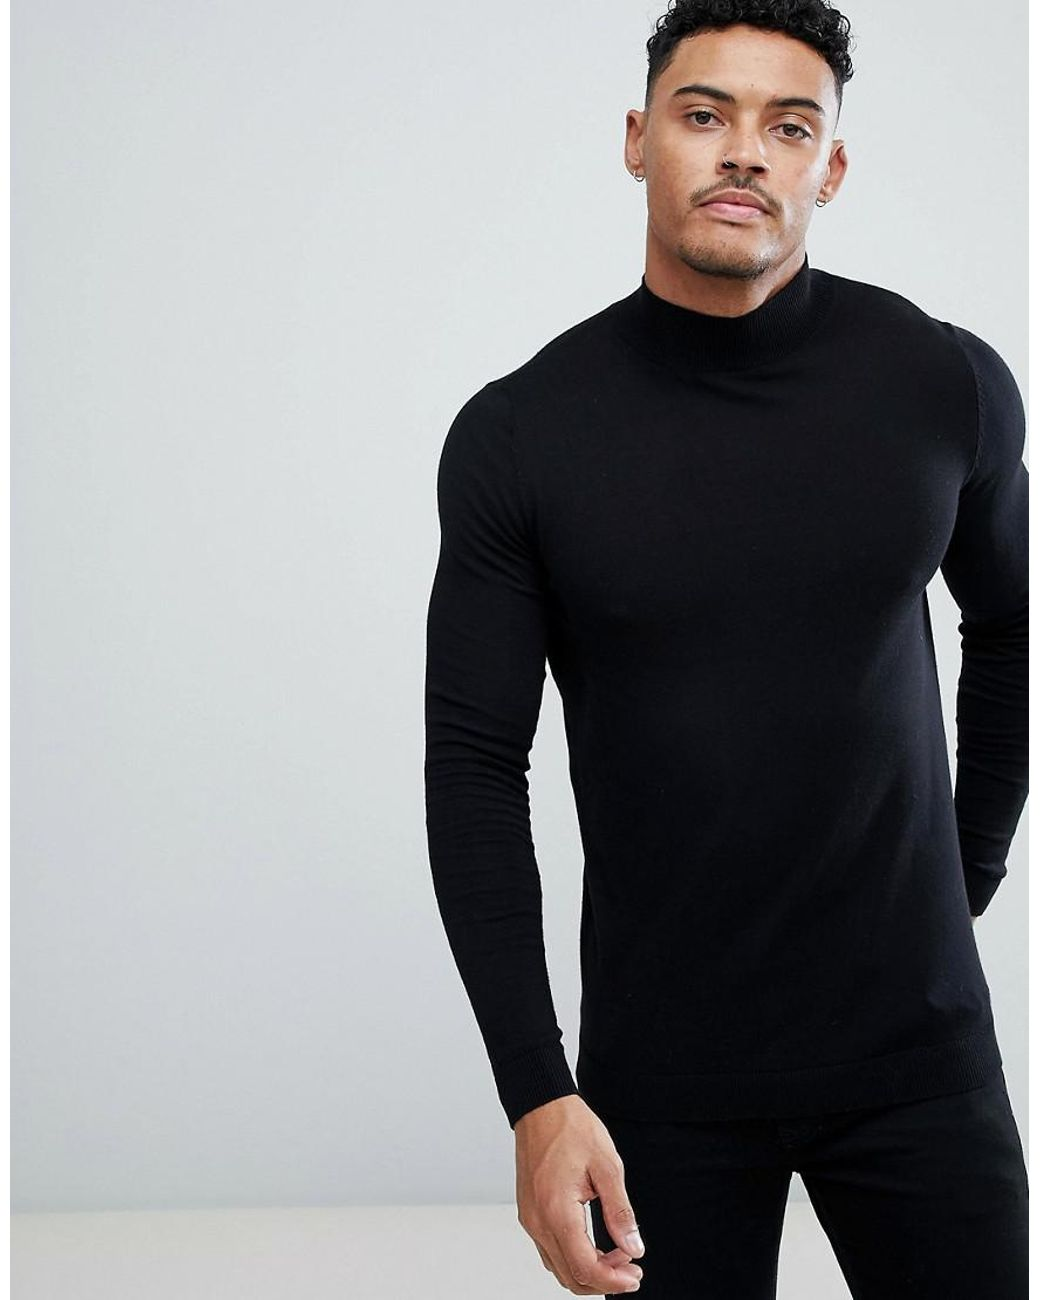 ffb32c32d41f ASOS Muscle Fit Turtle Neck Jumper In Black in Black for Men - Lyst